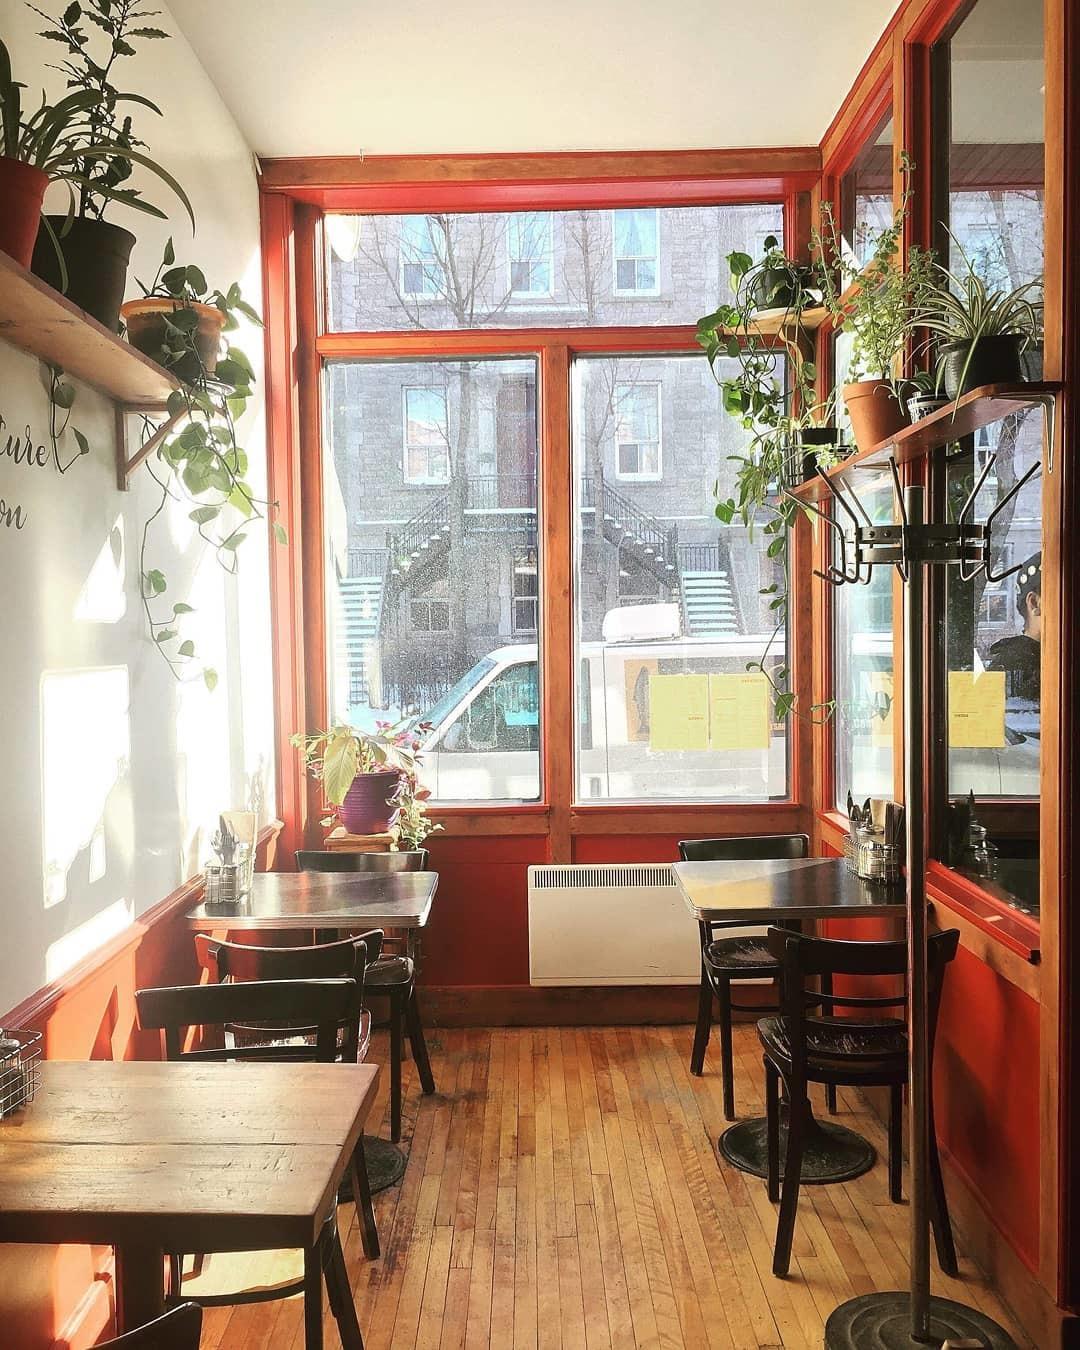 Café Coop Touski